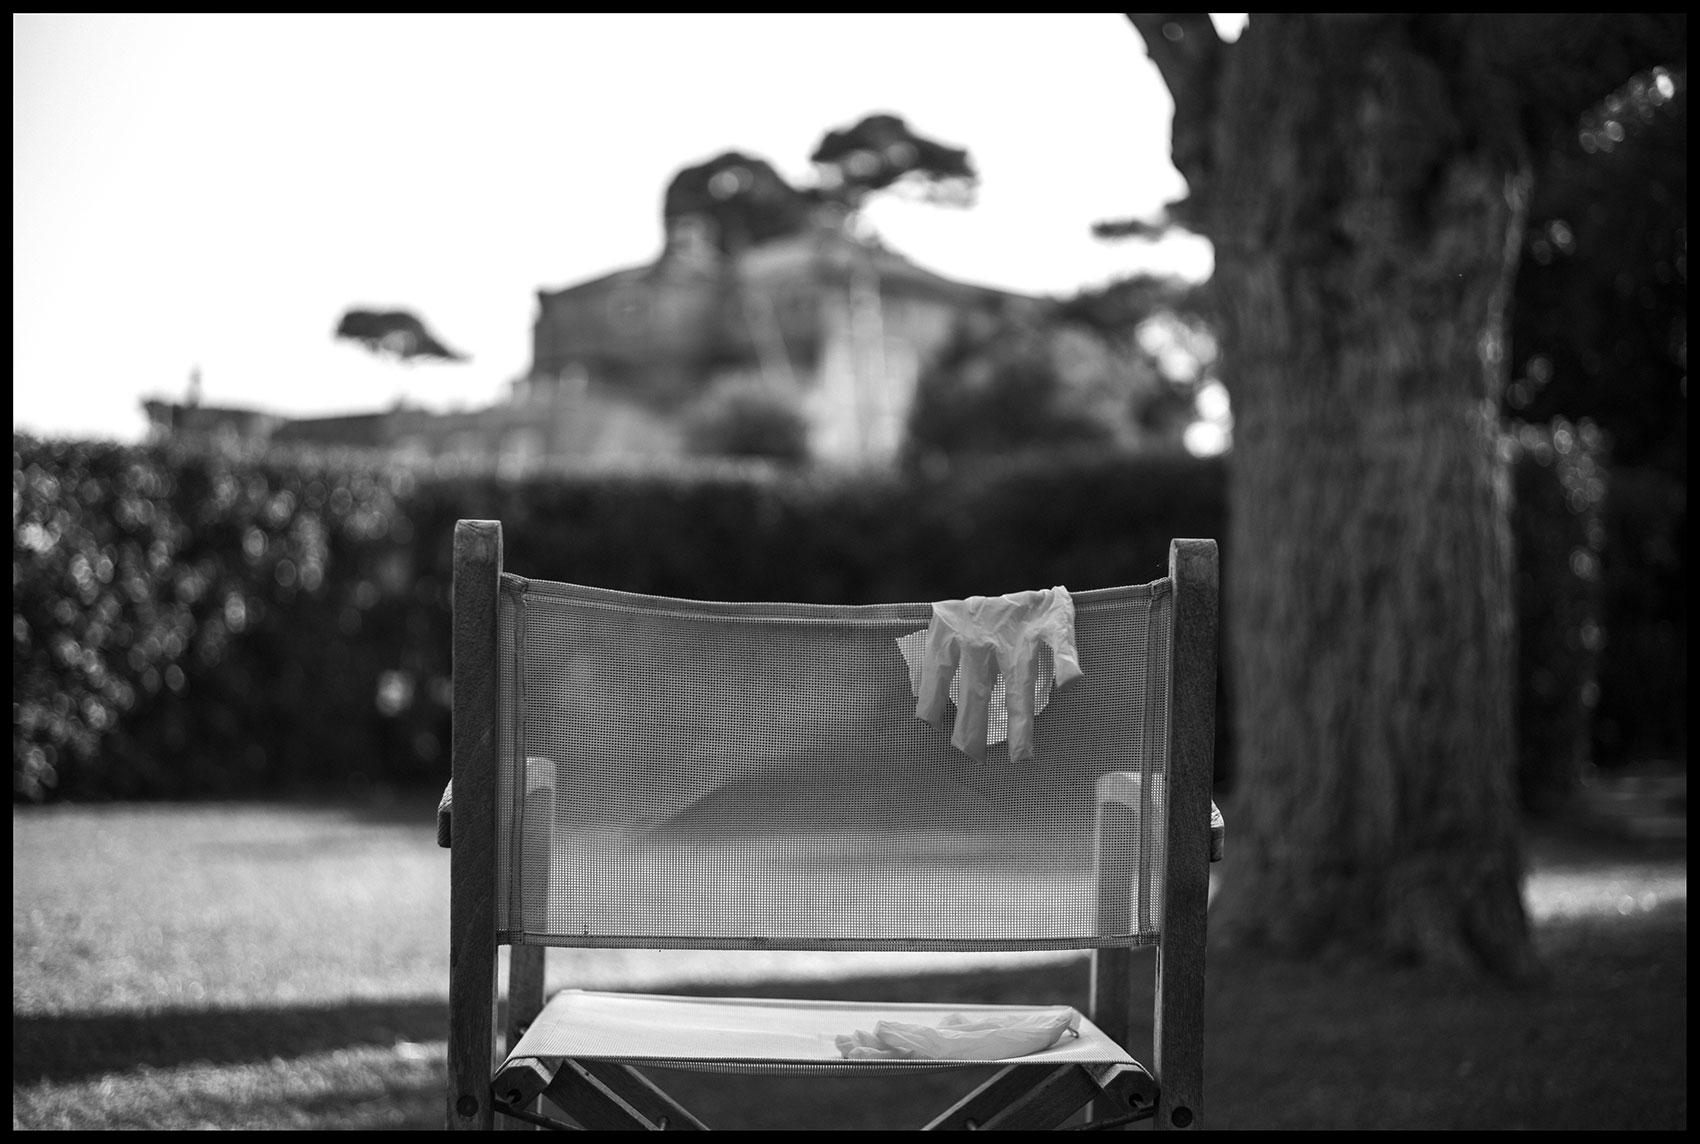 The Glove | Album QUARANTINE | Stefano Paradiso - Photographer